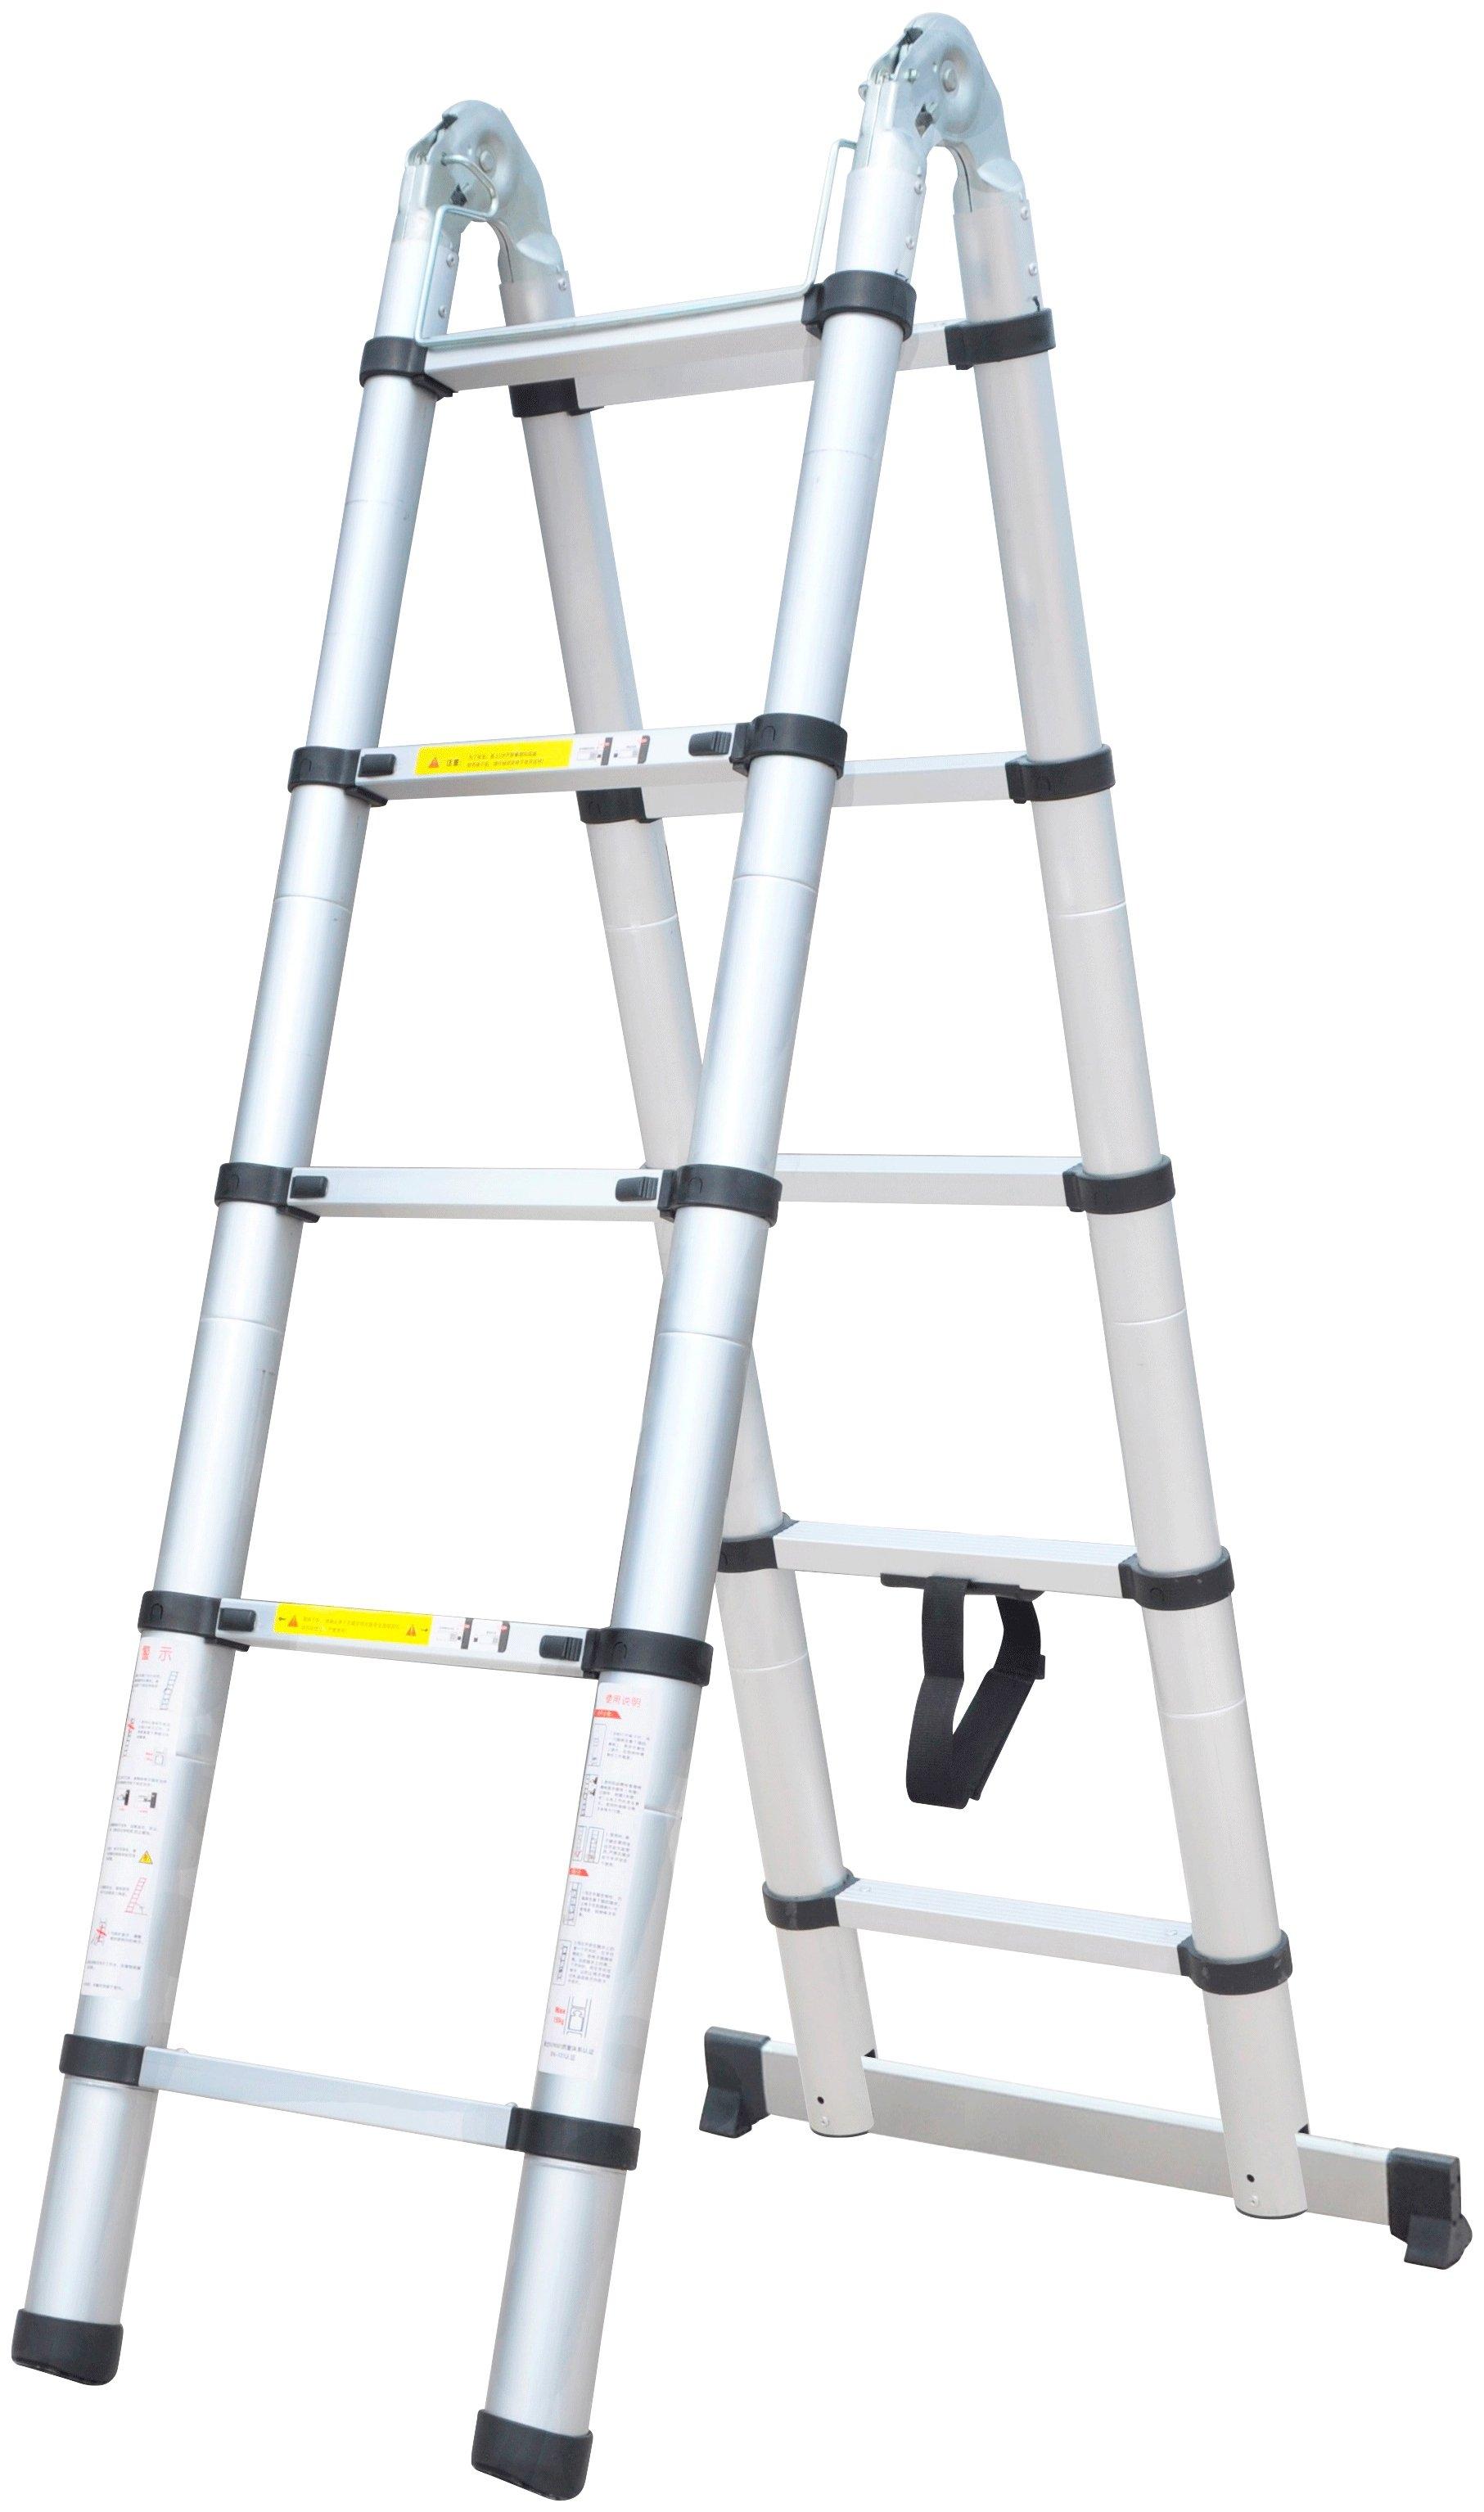 ladder kopen groot aanbod aan ladders al vanaf 49 99 otto. Black Bedroom Furniture Sets. Home Design Ideas